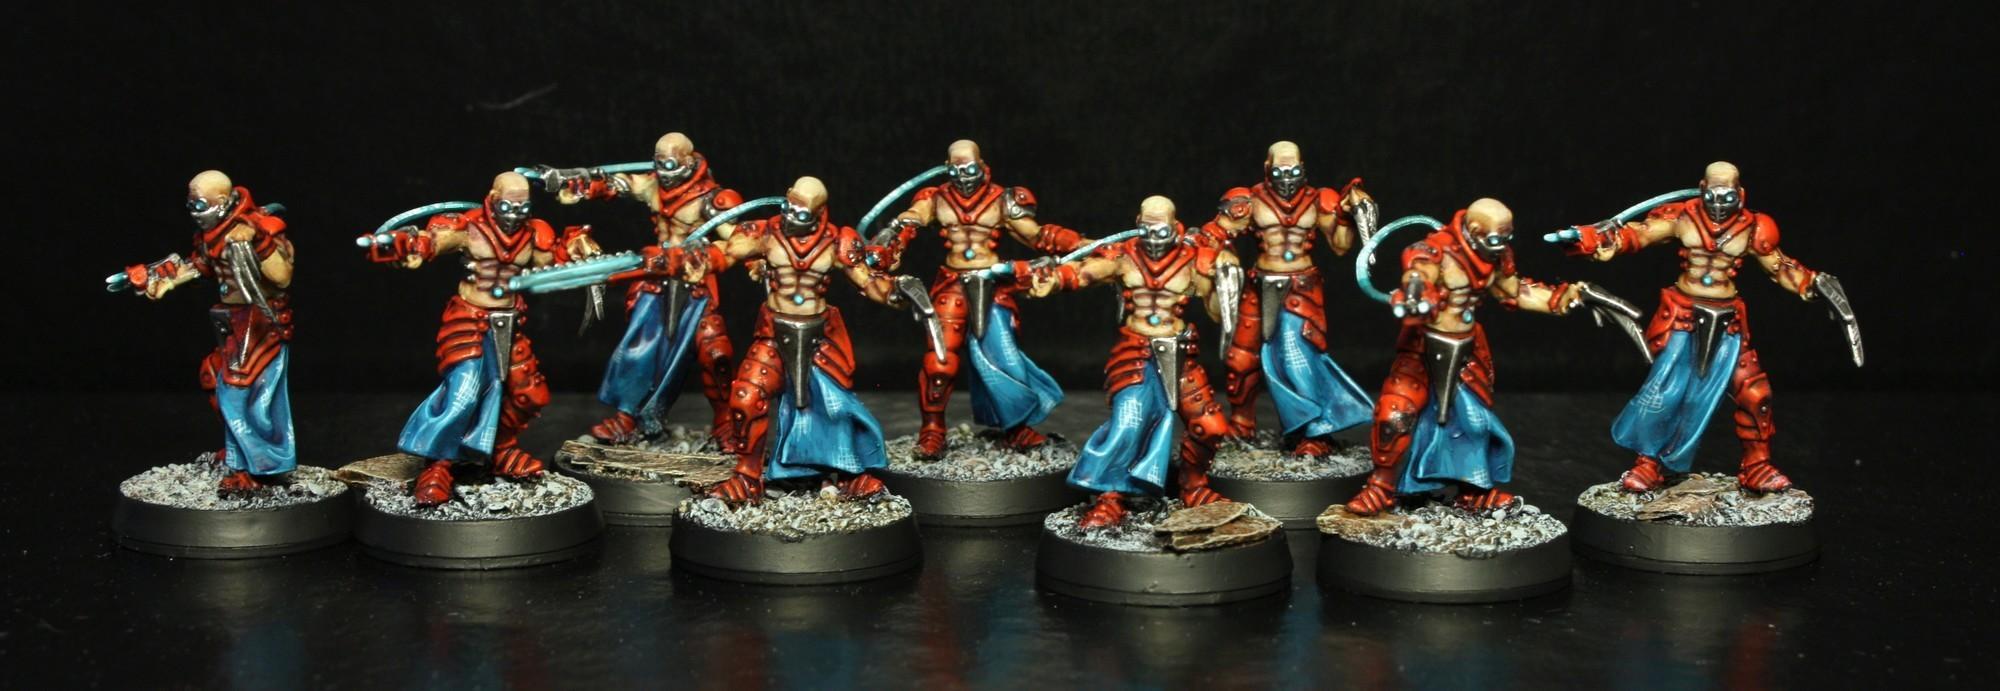 Confrontation, Dark, Dirz, Eldar, Gorgon, Key, Rackham, Red, Turquoise, Wracks